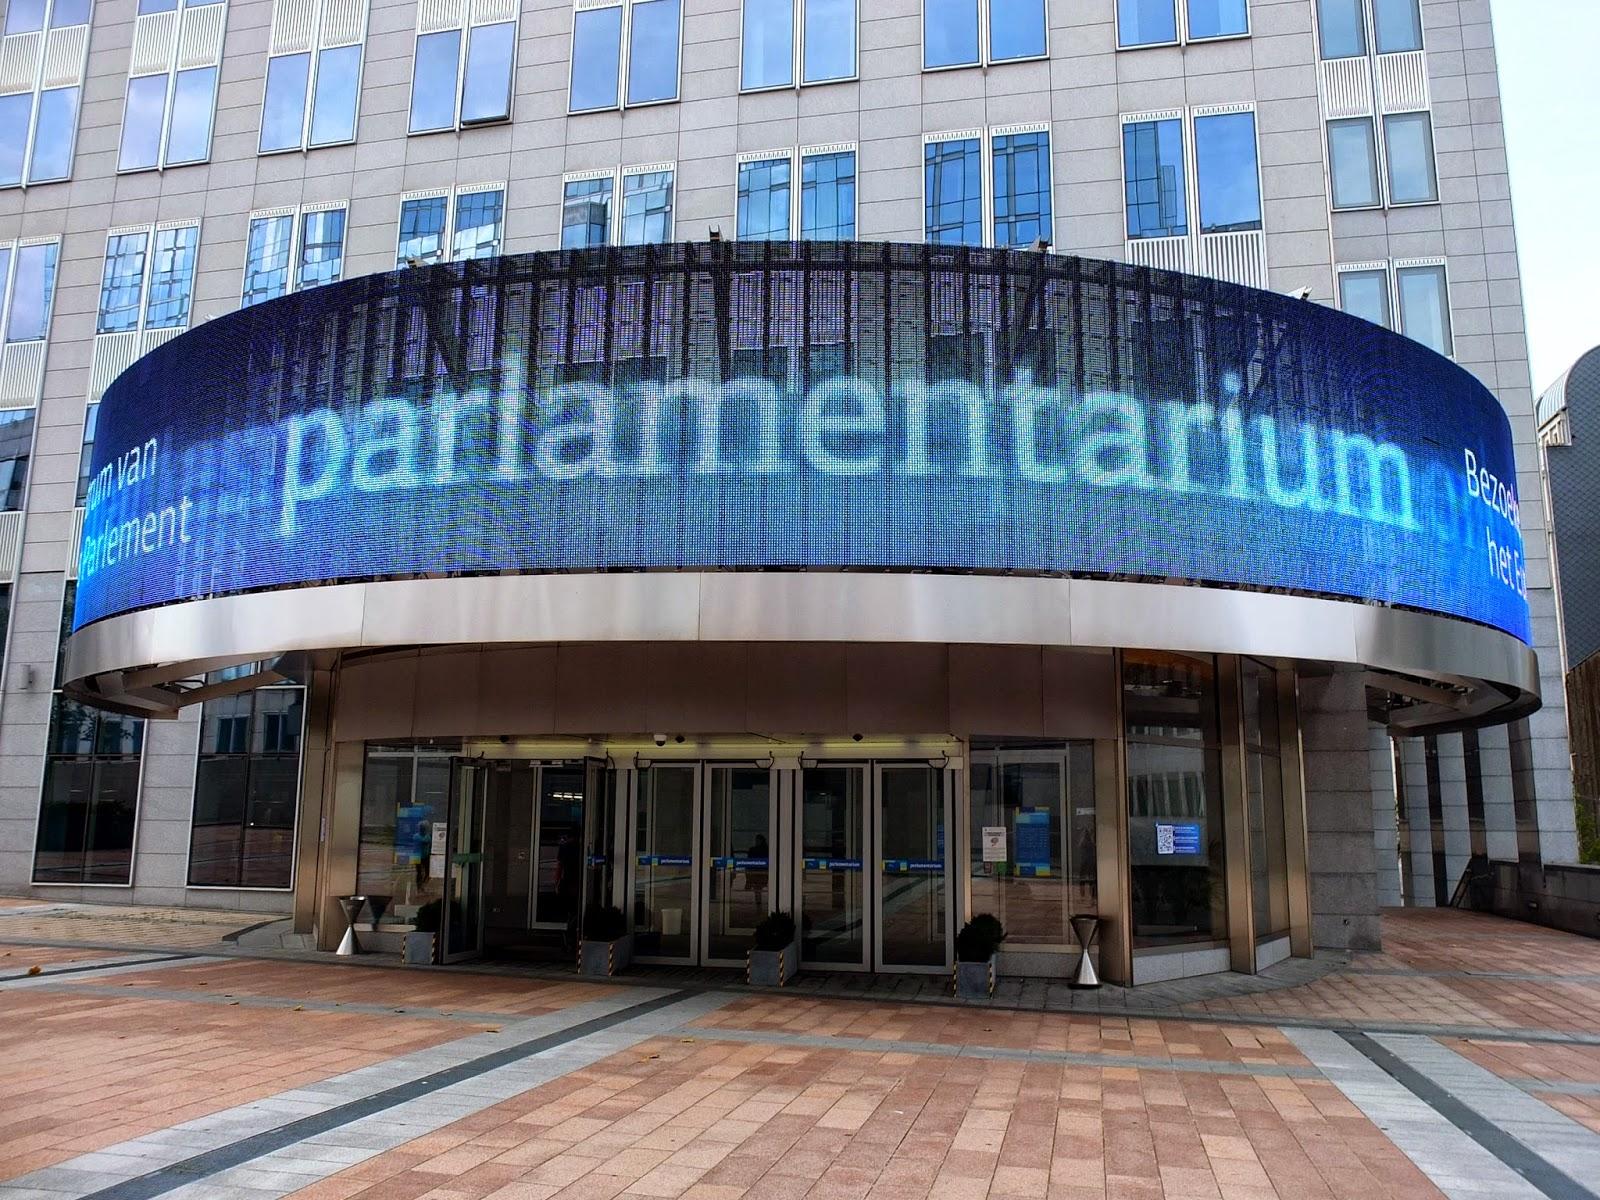 EU, Europaviertel, Leuchtschrift, Parlament, Institution